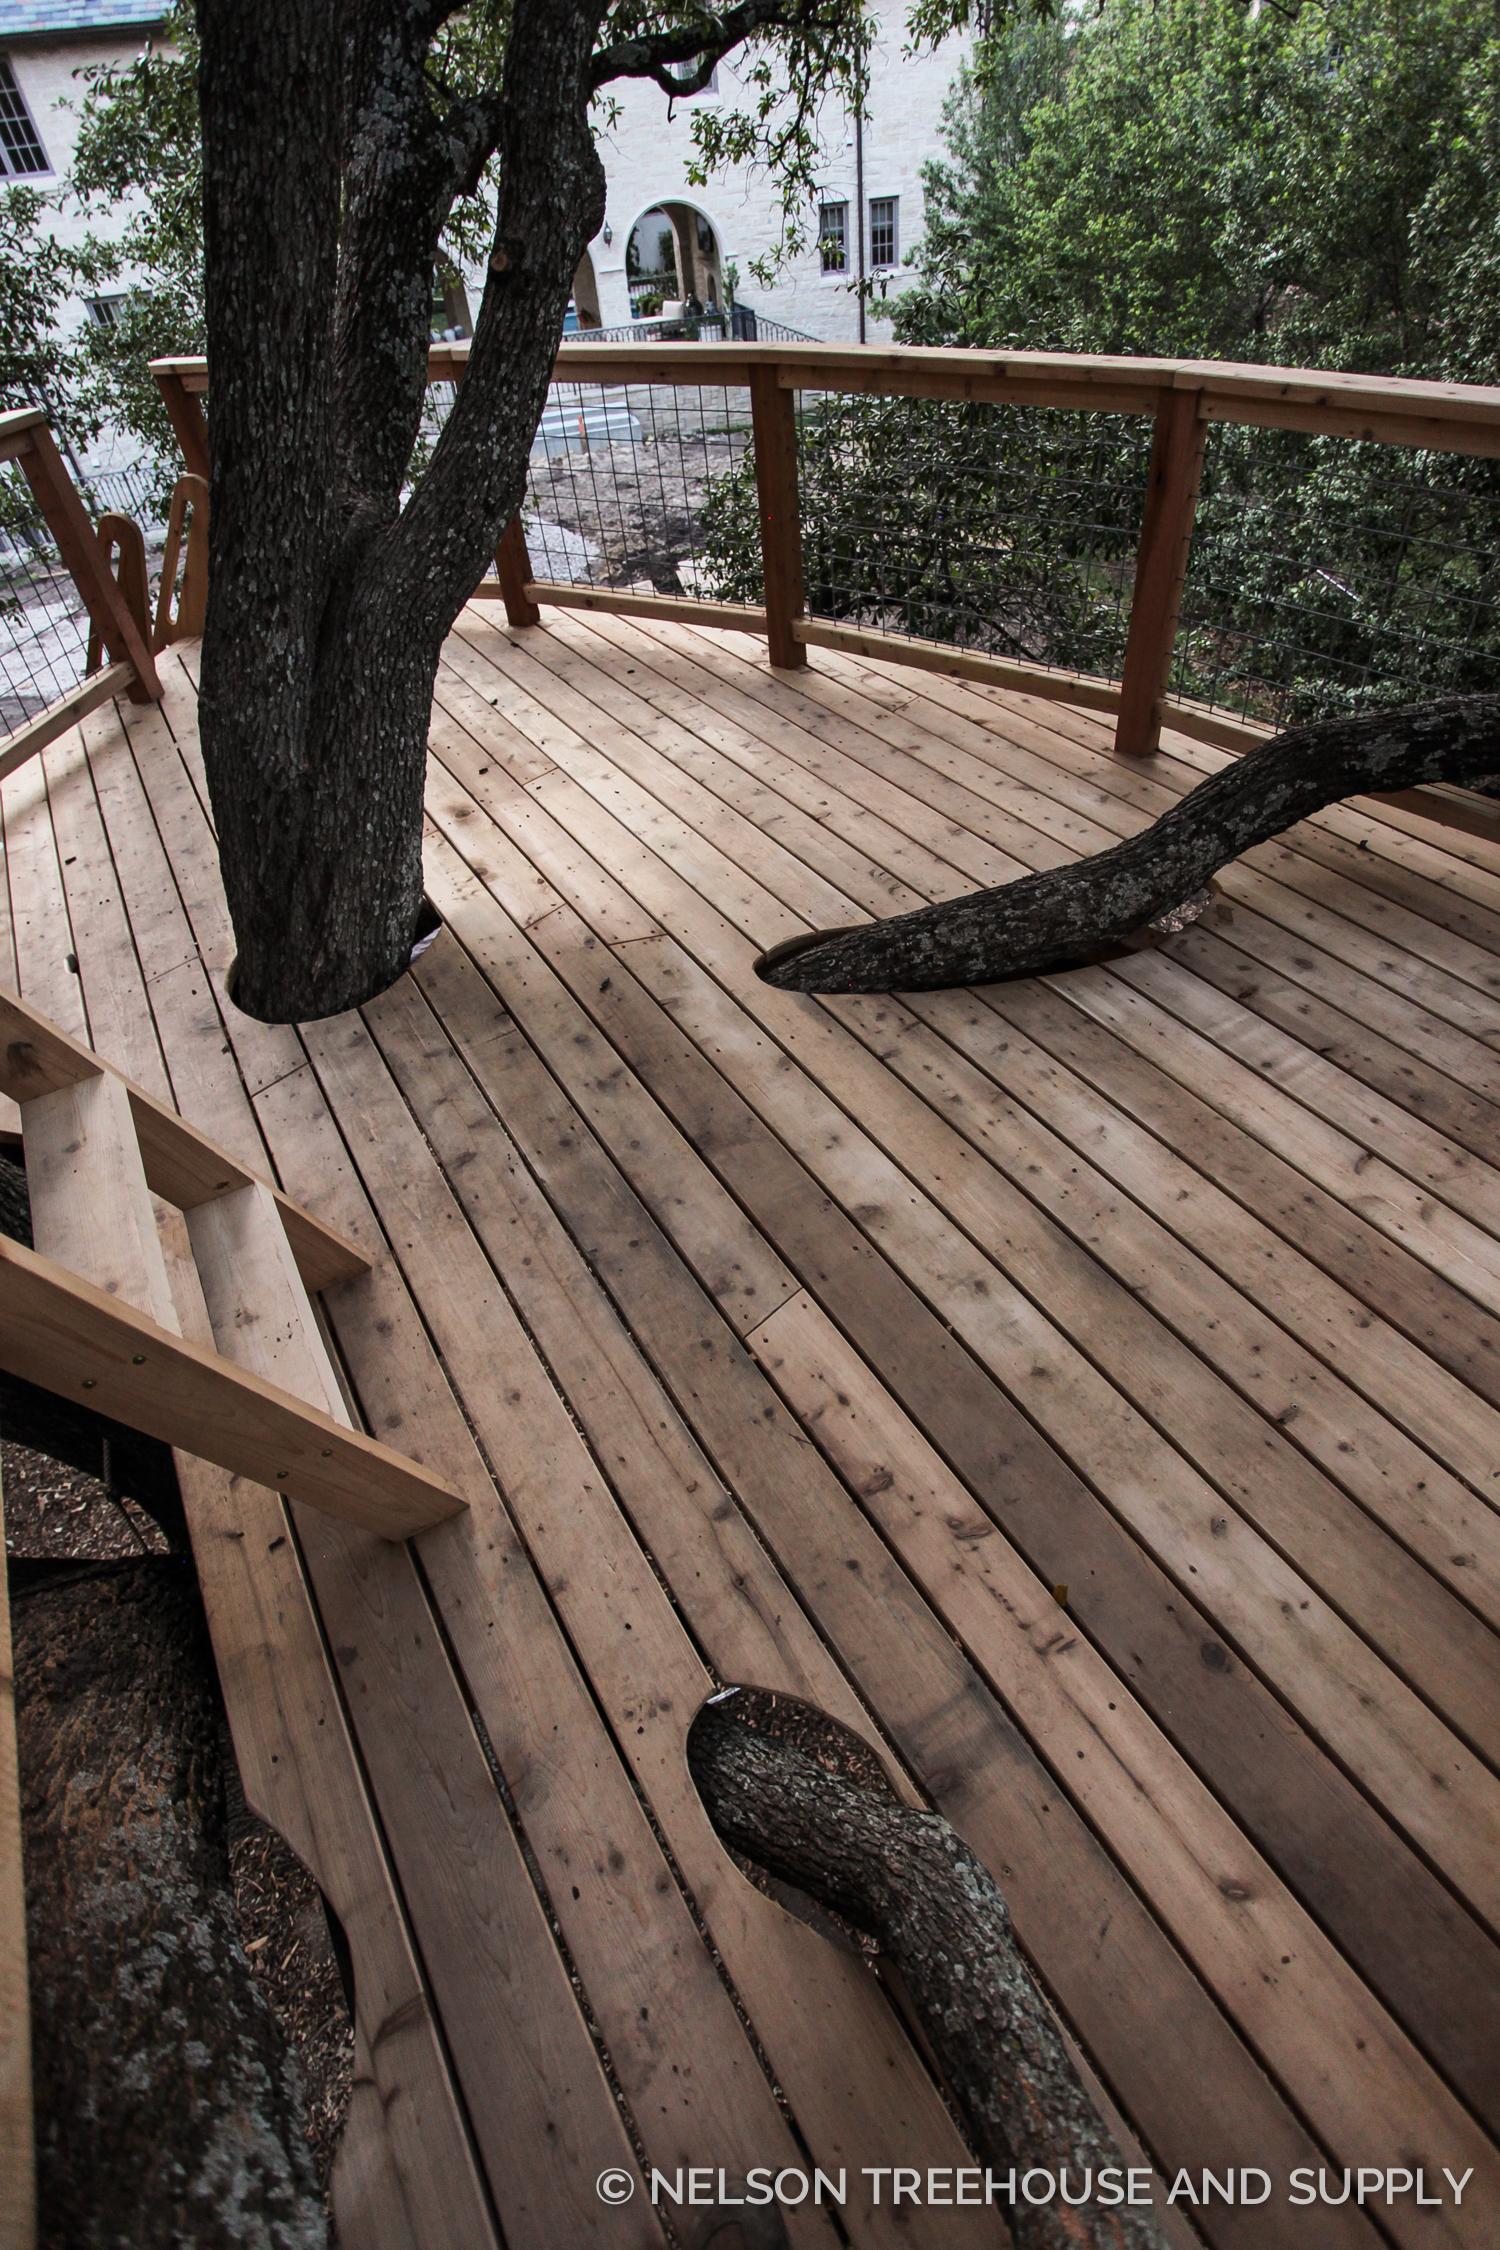 Quercus Treefort-icus Treehouse